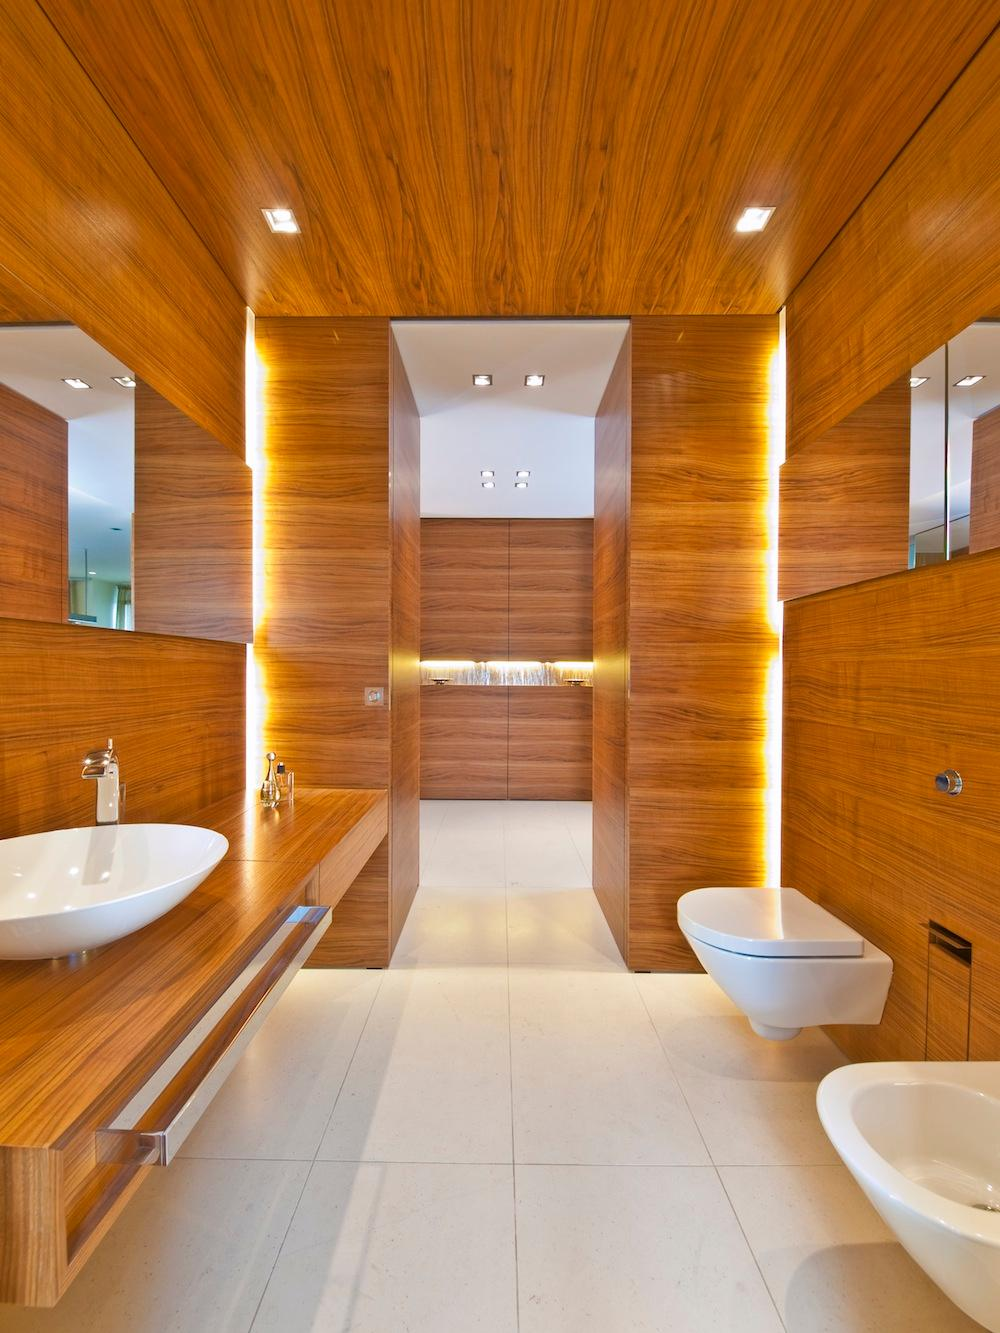 Badezimmer Holz • Bilder & Ideen • COUCH